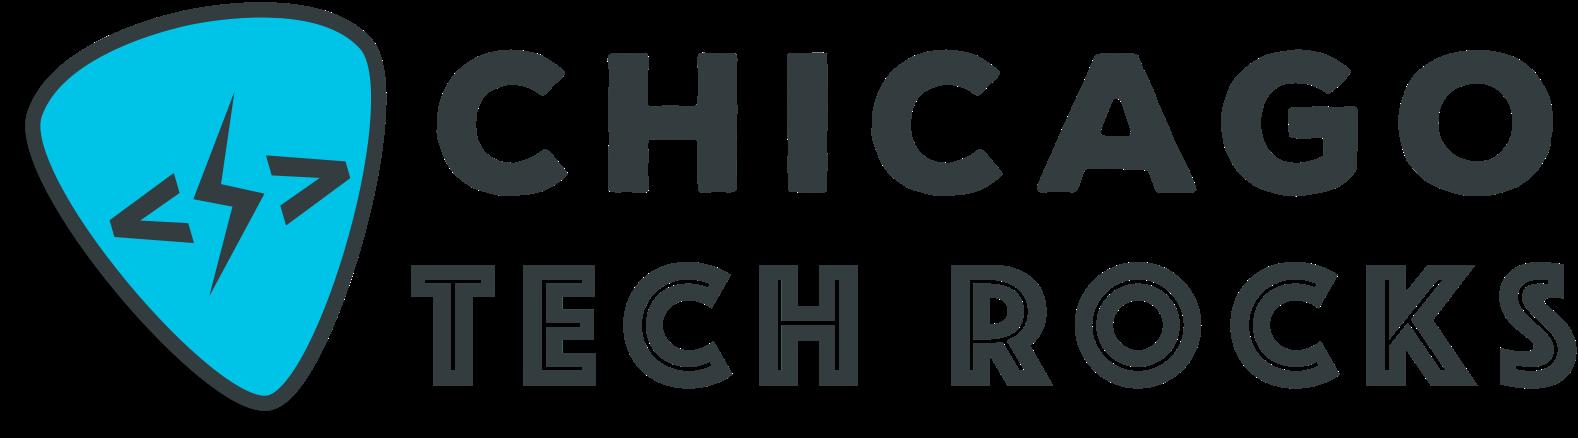 ChicagoTechRocks.png